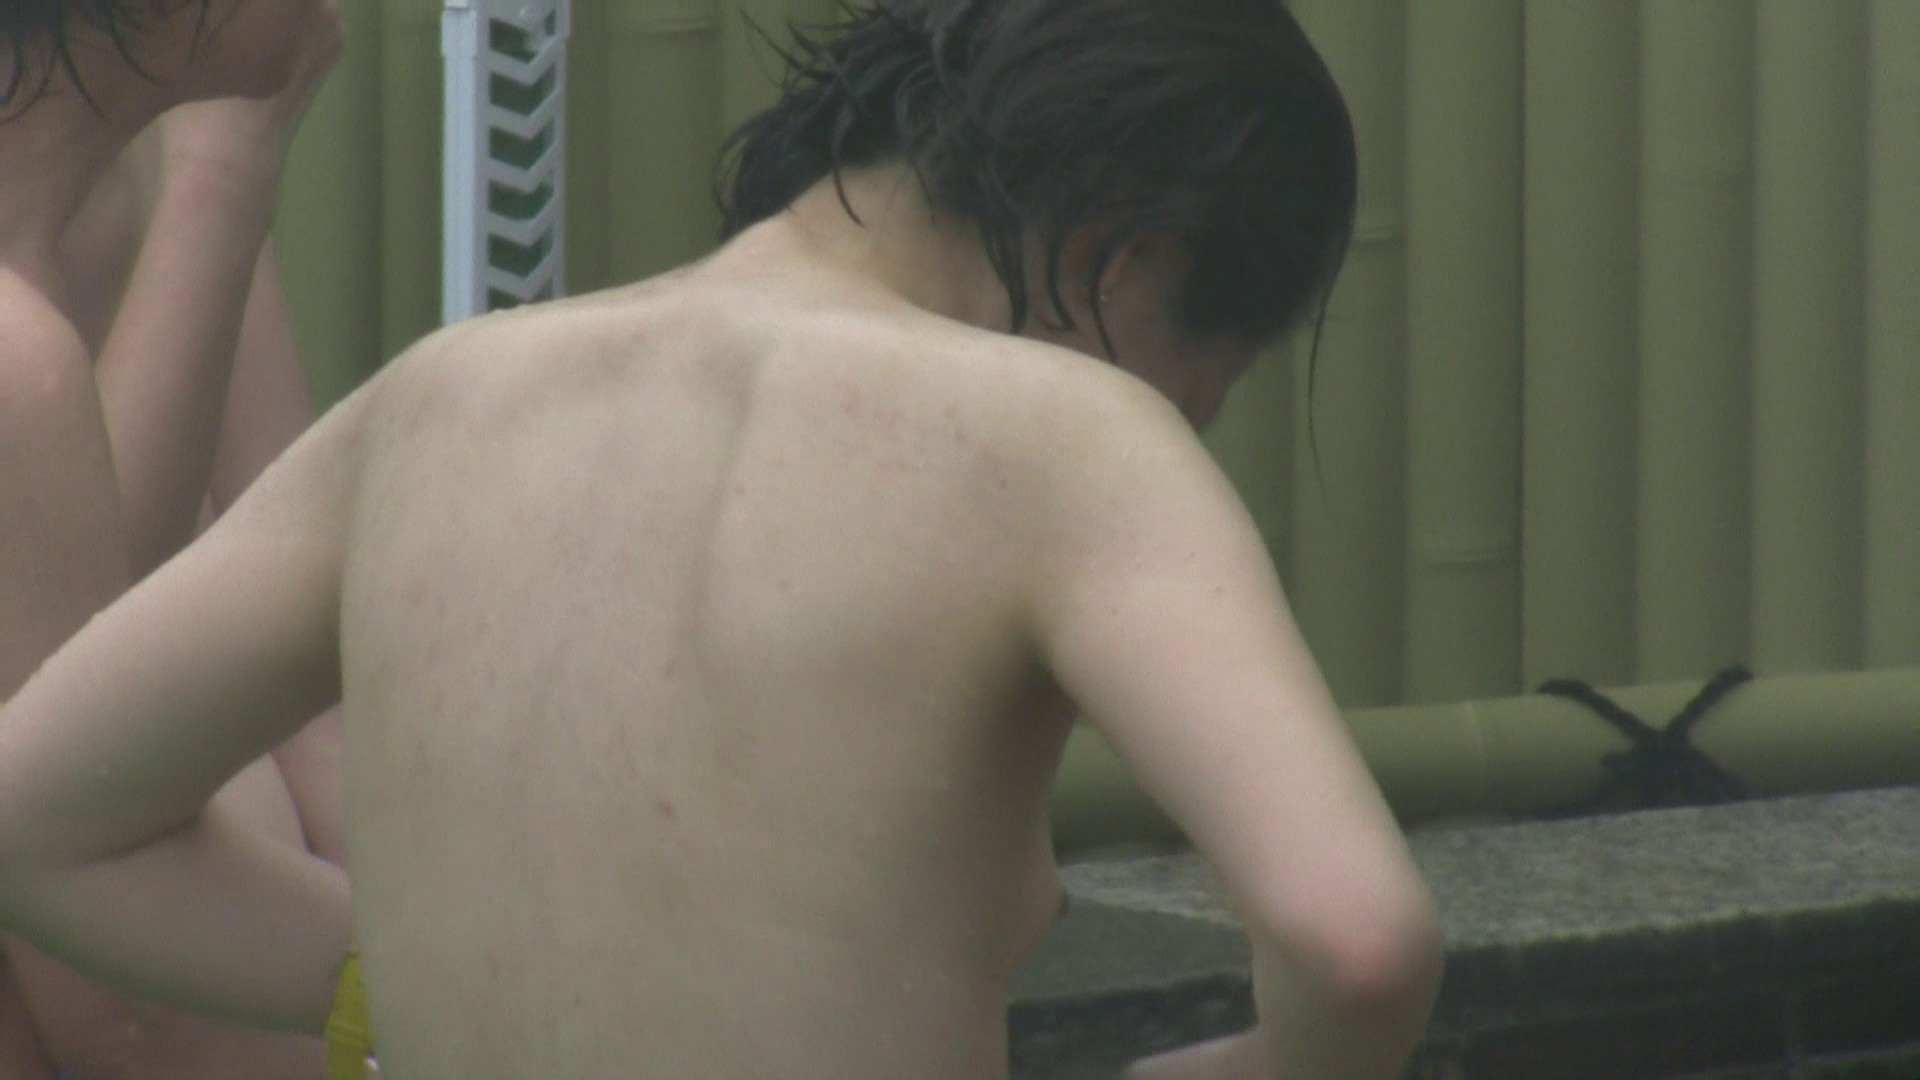 Aquaな露天風呂Vol.584 0 | 0  95連発 85